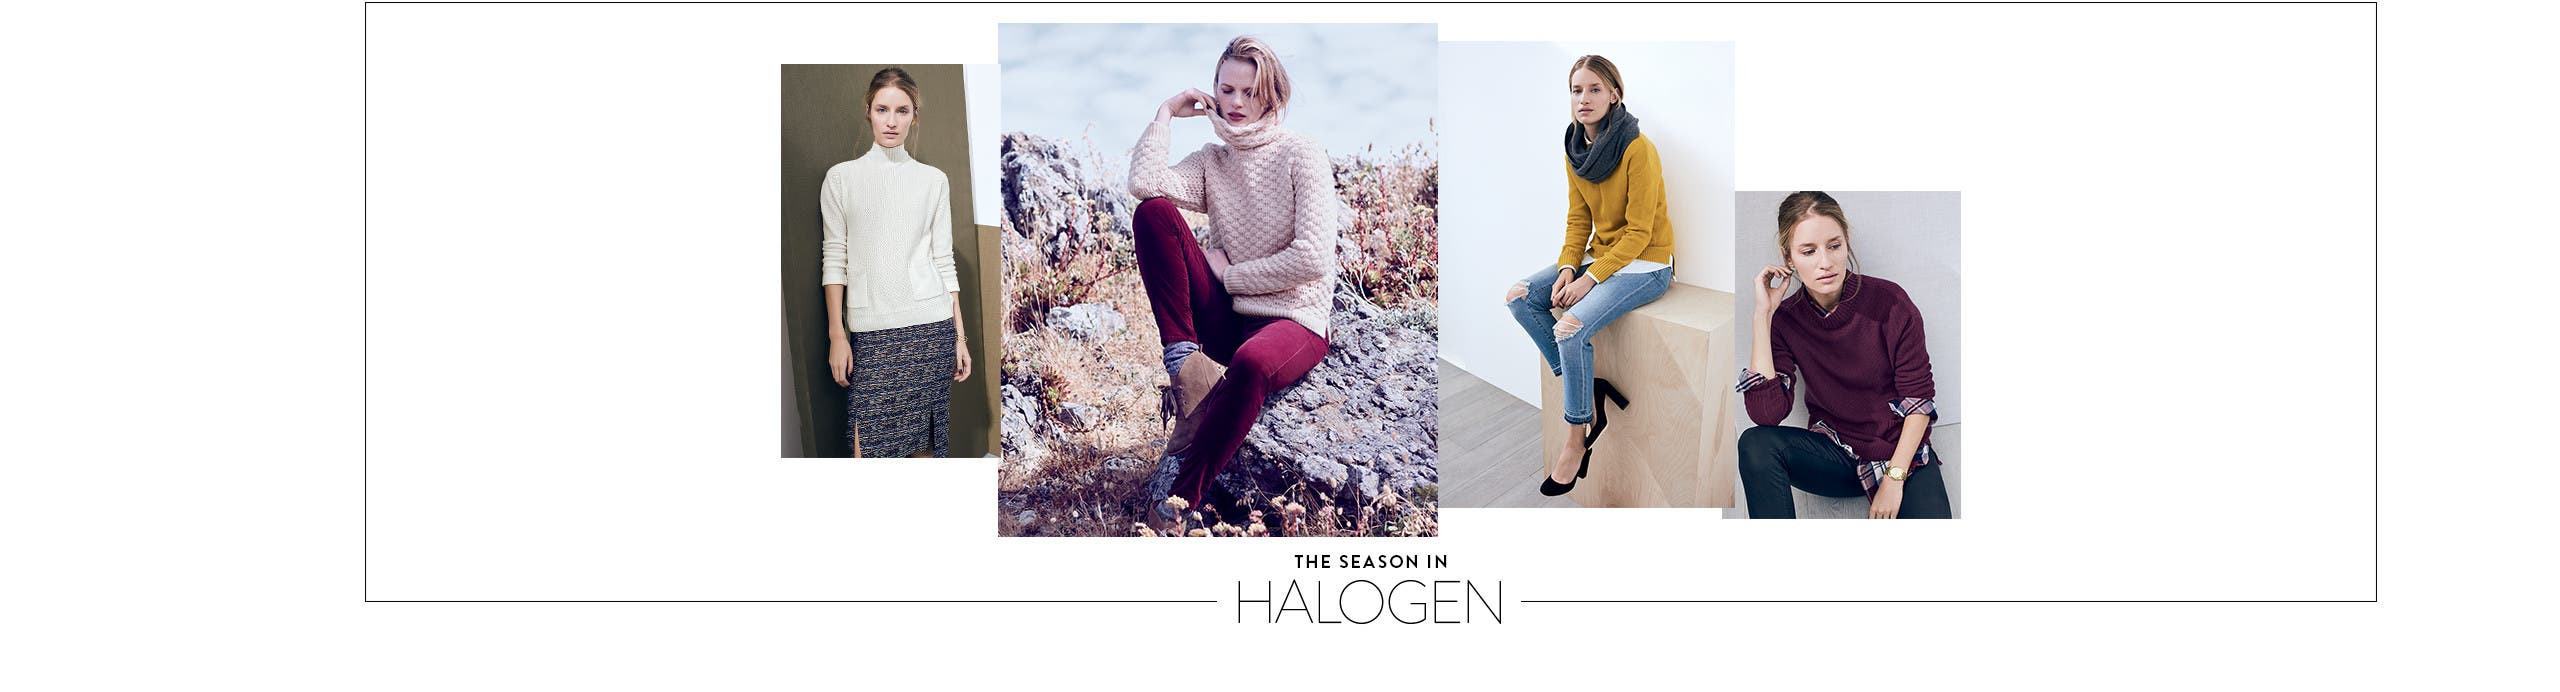 The season in Halogen.